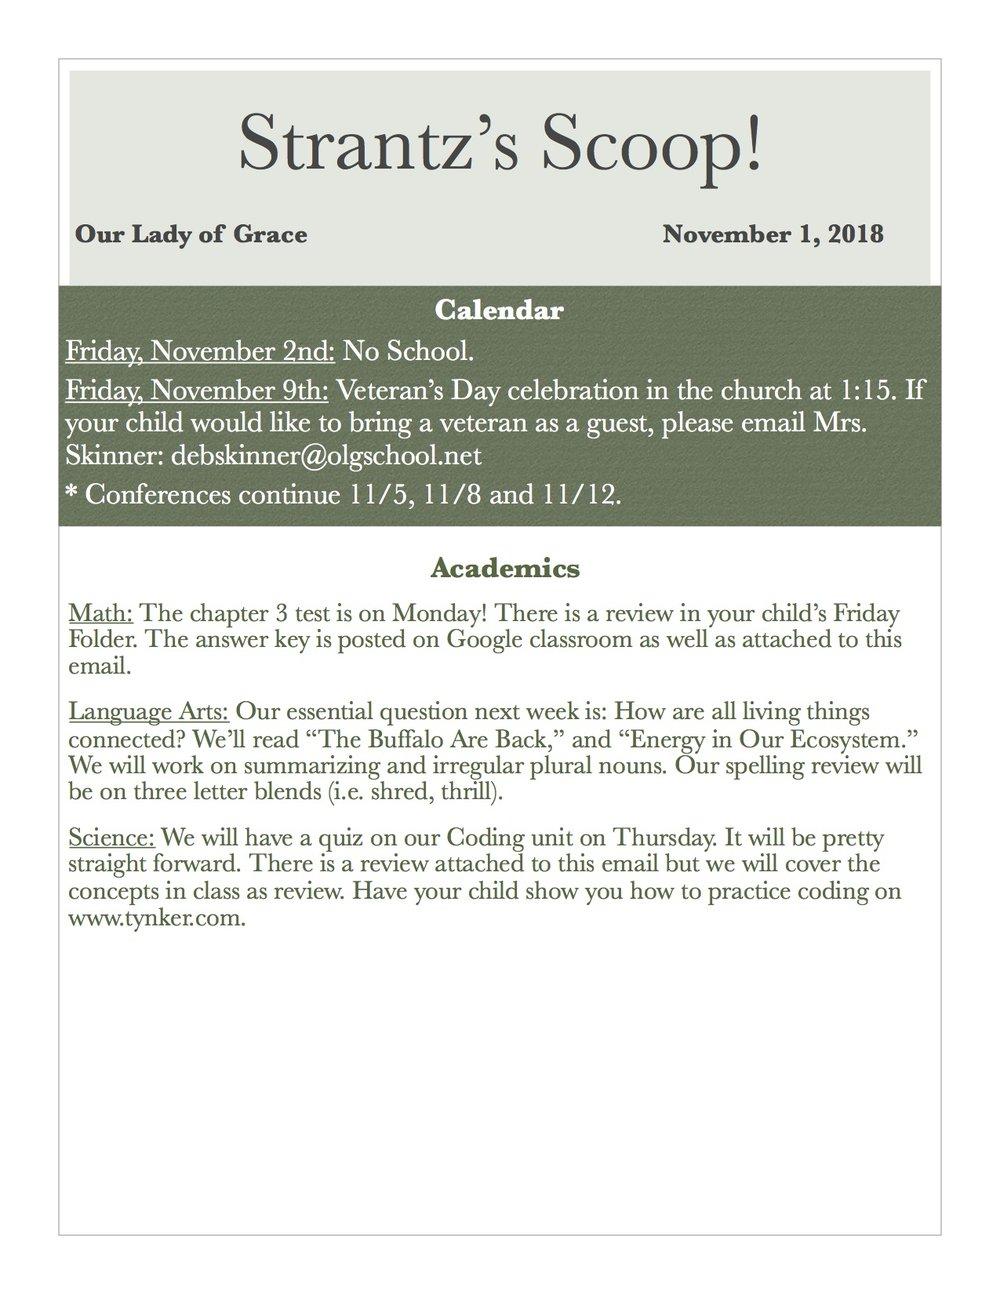 StrantzScoop11-1-18.jpg